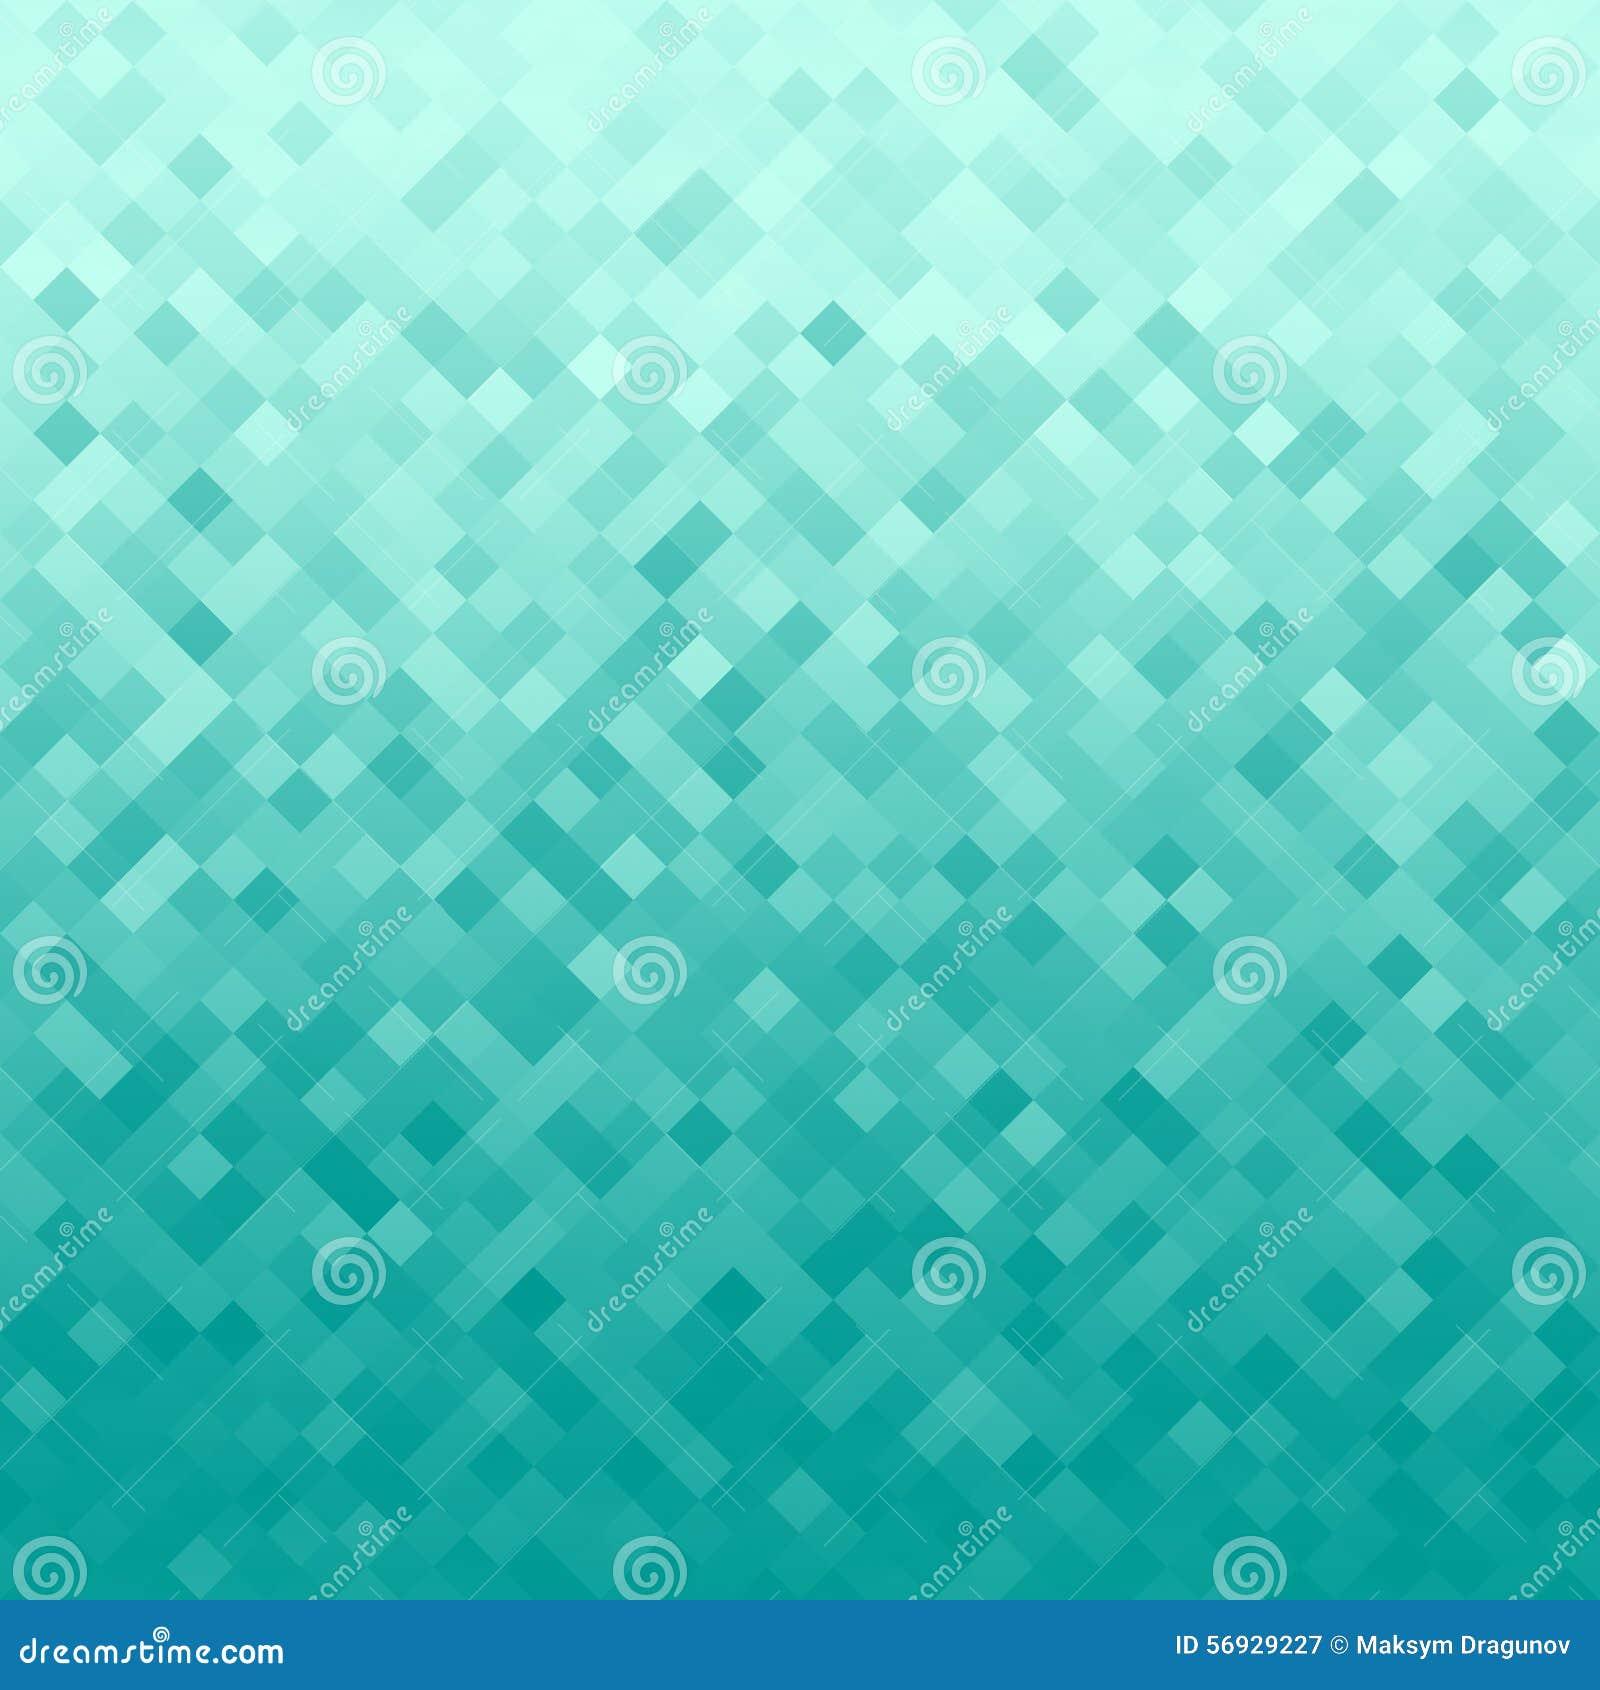 Sea-green Tiles Stock Illustration - Image: 56929227